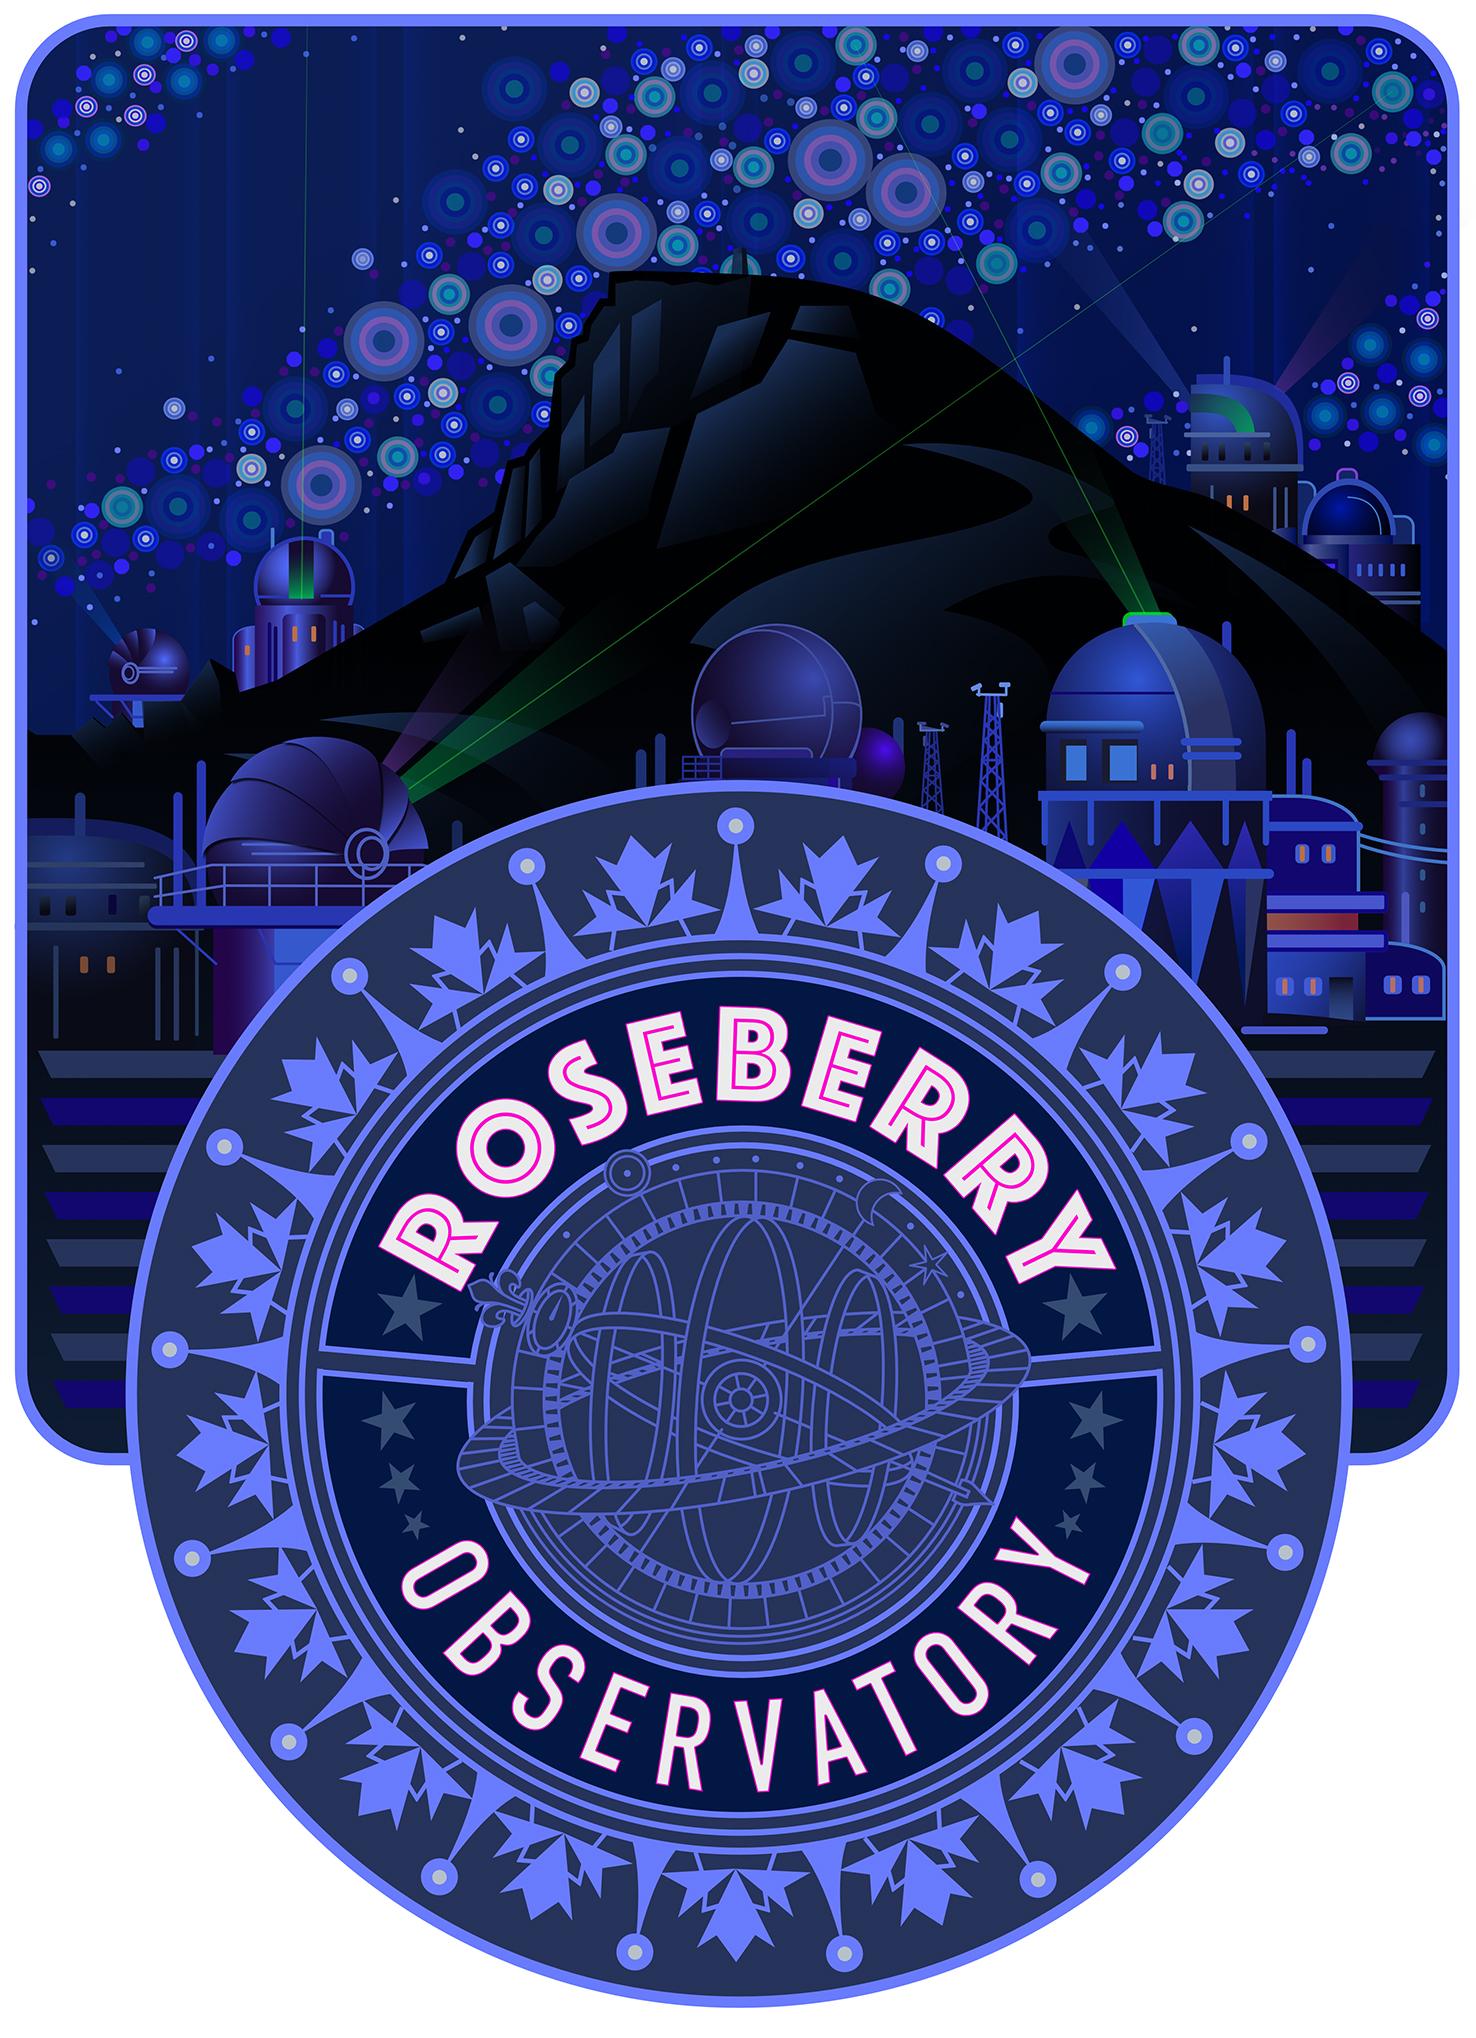 Roseberry Observatory